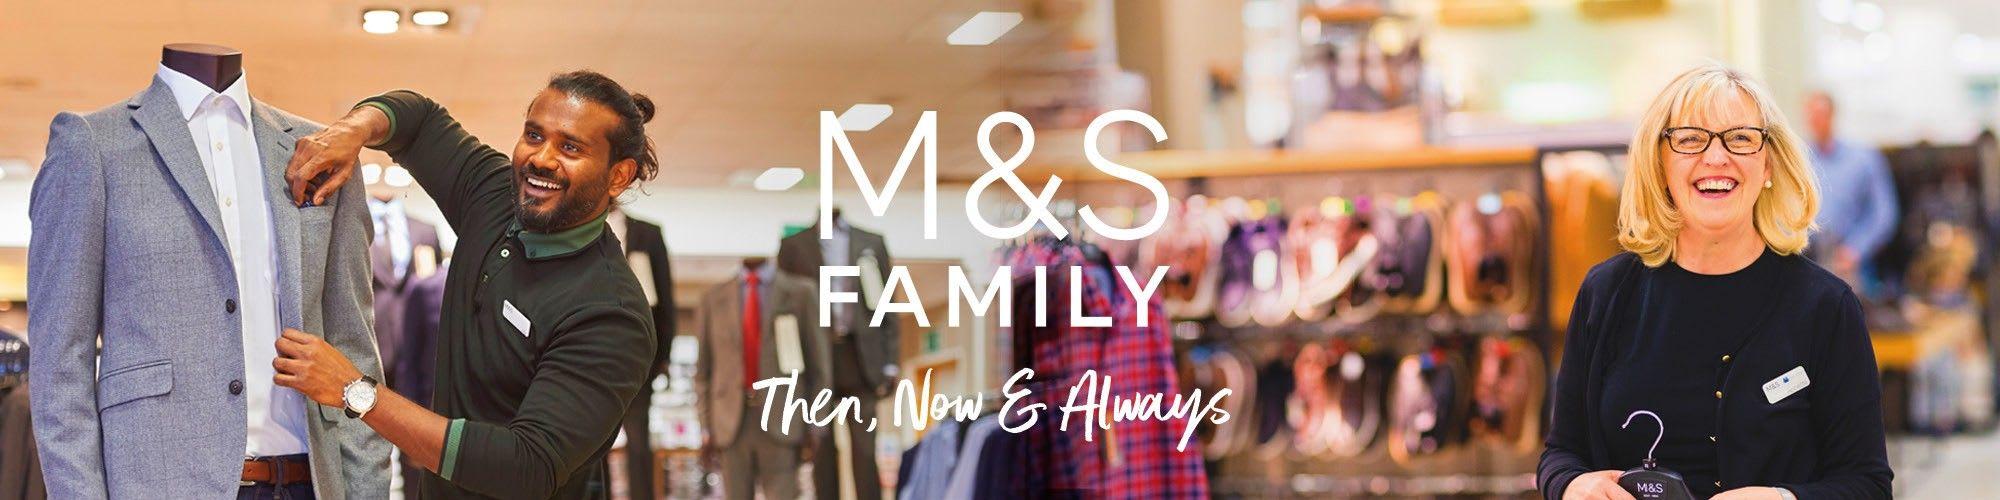 M&S Alumni Network